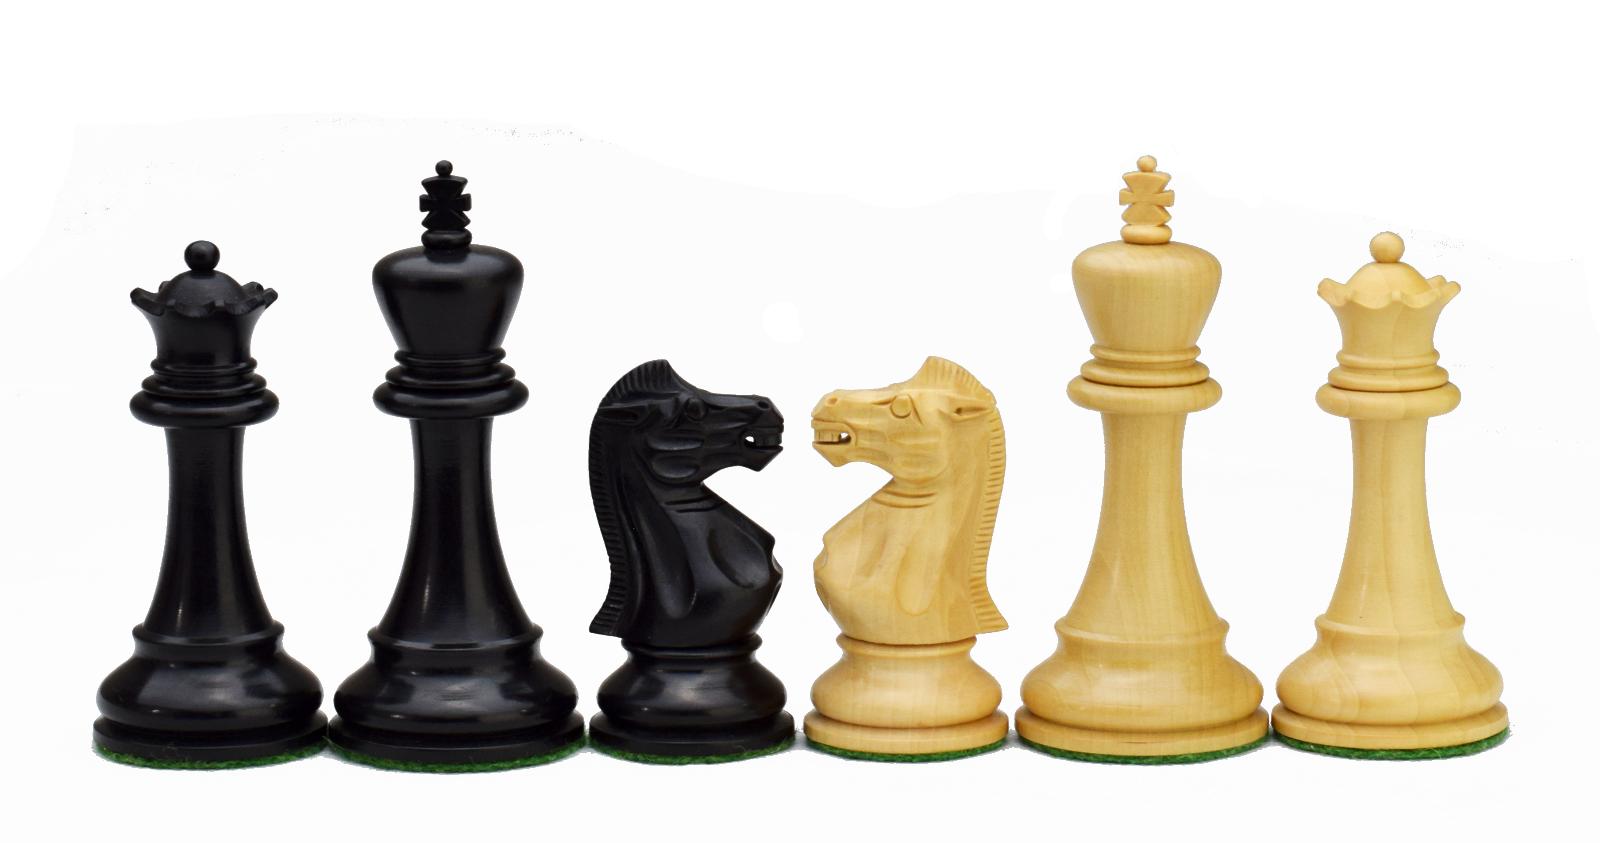 ROOGU Old English Series  3.5'' 3.5'' 3.5'' Staunton Jeu d'échecs Bois 4x Dames Fait Main 626ba1